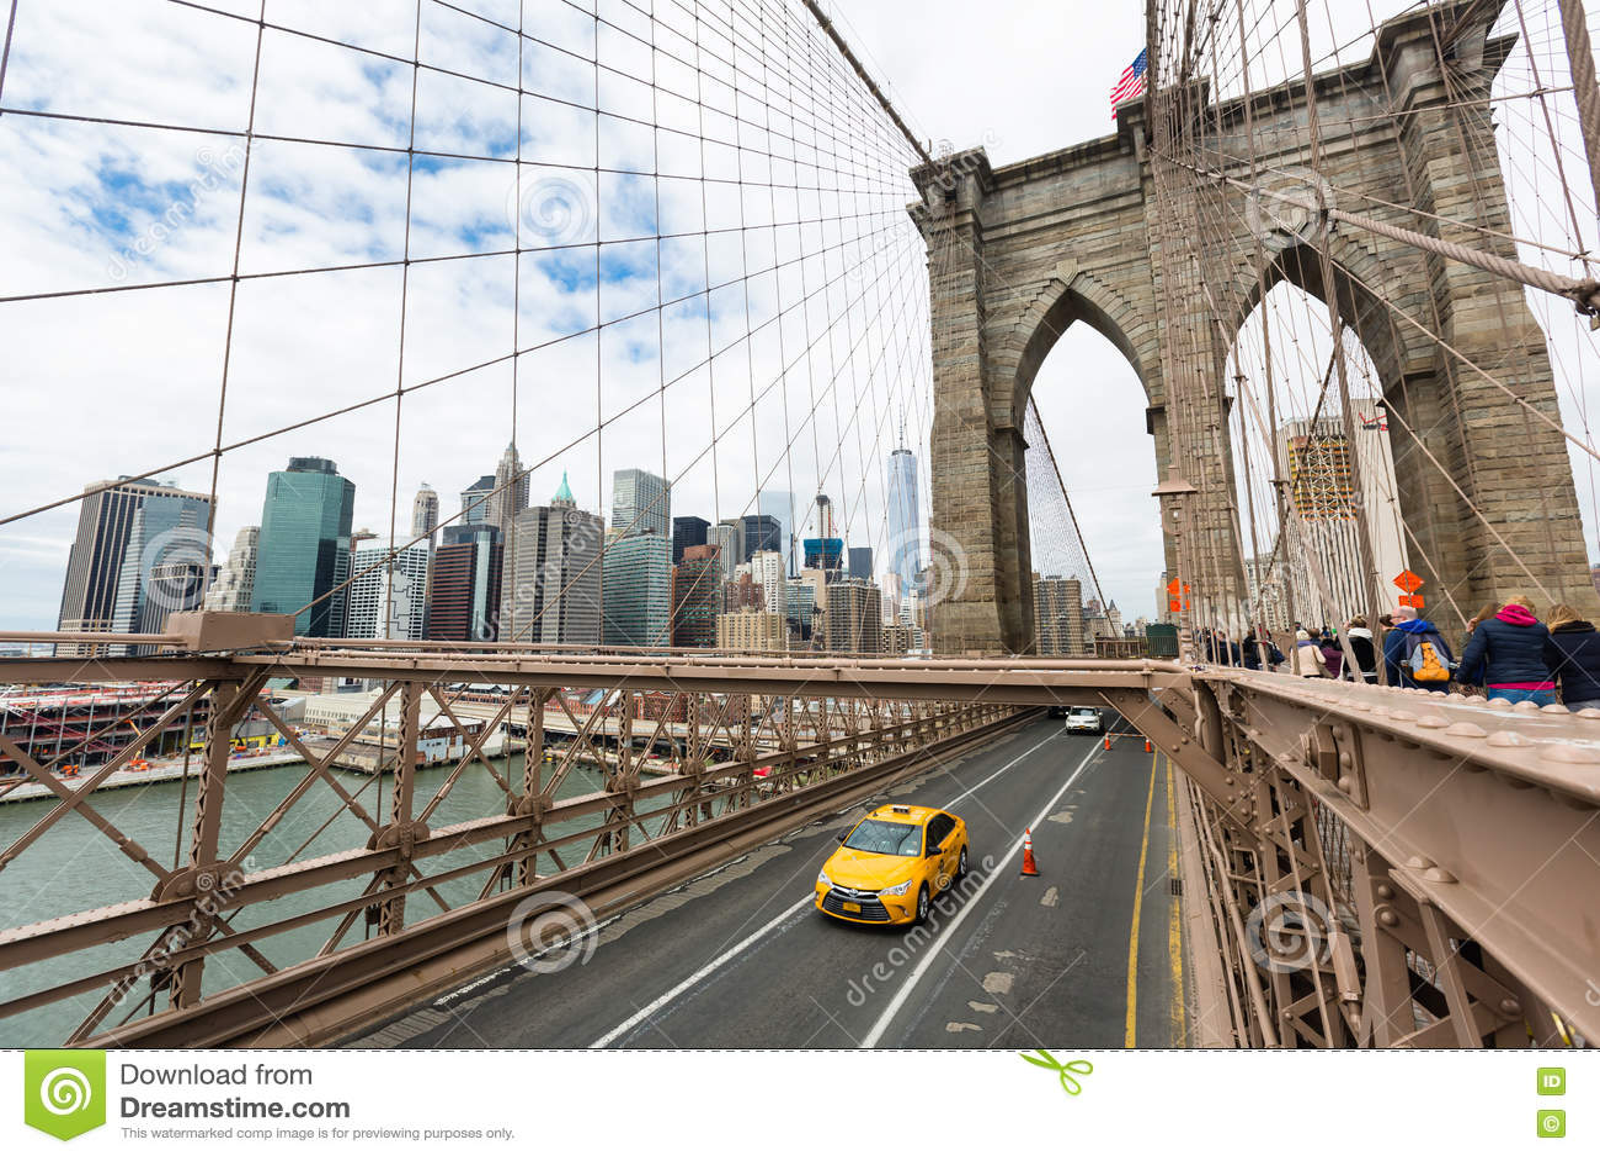 voitures croisant le pont de brooklyn new york photo stock ditorial image 75302608. Black Bedroom Furniture Sets. Home Design Ideas